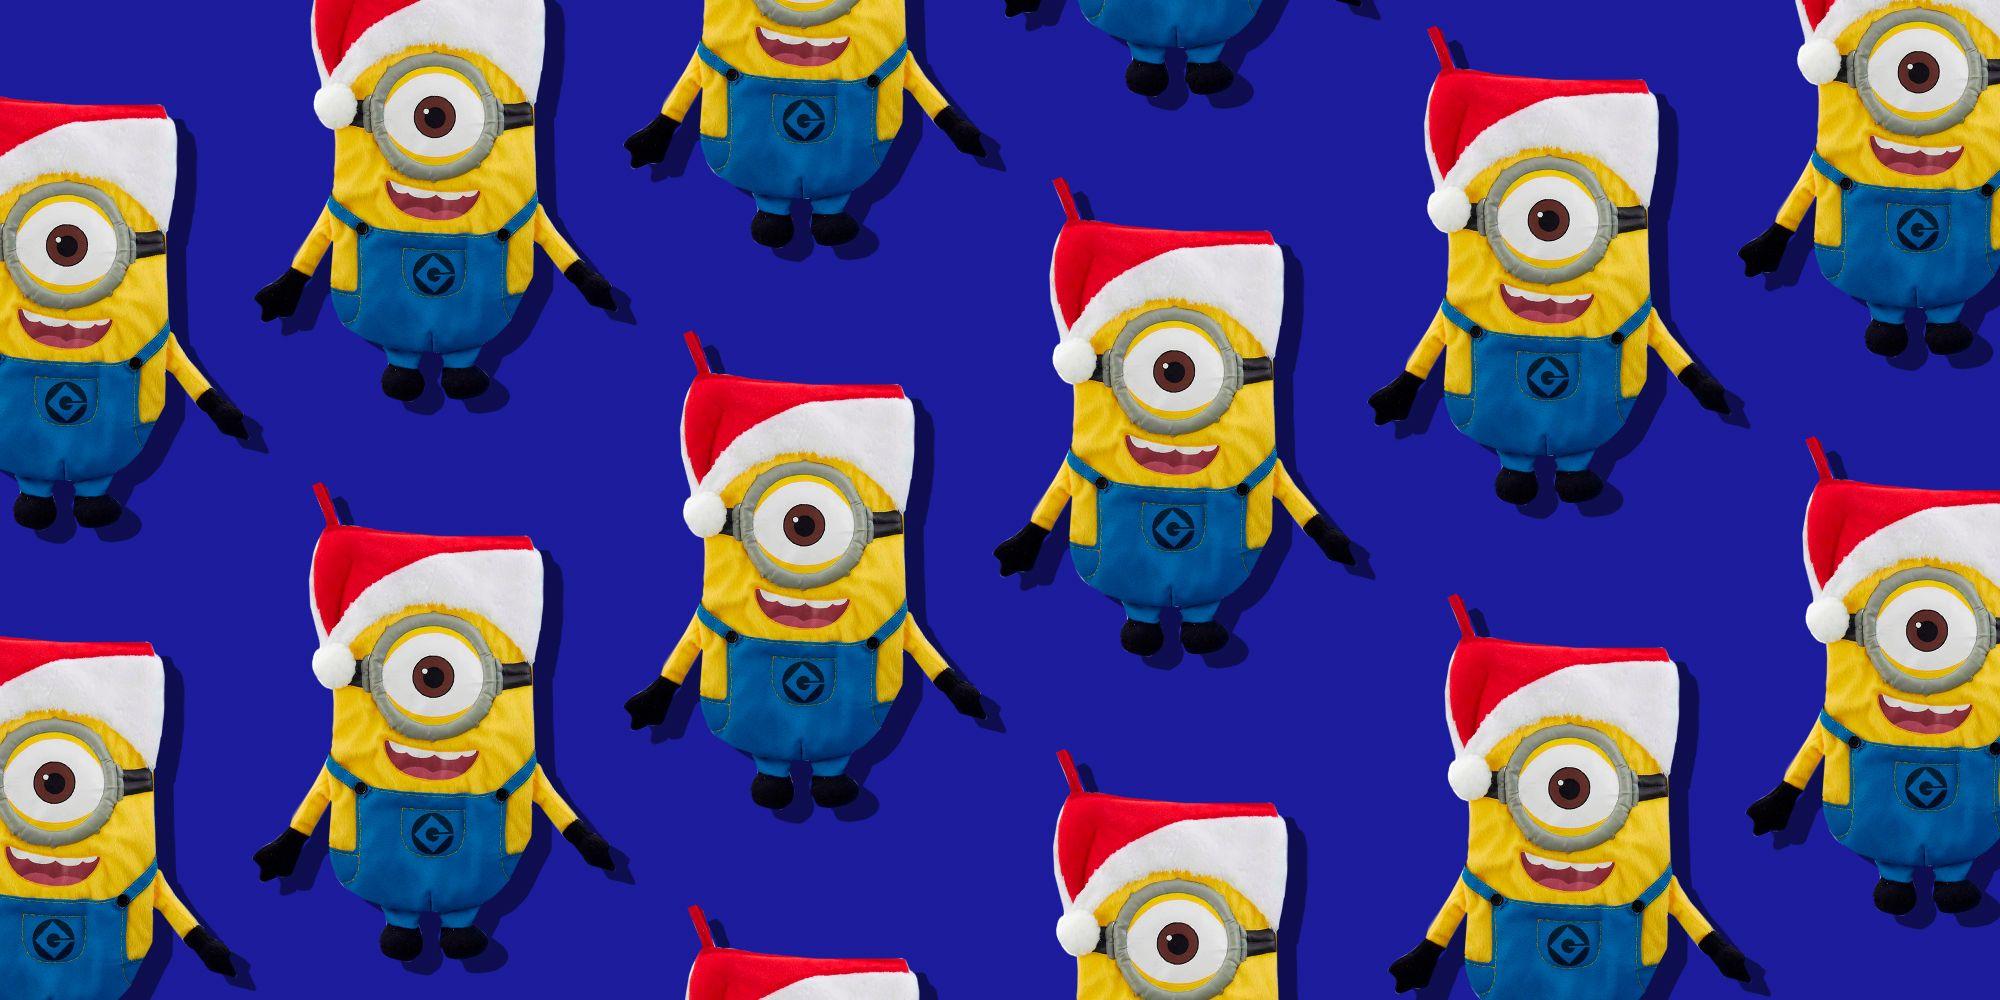 7 Best Kids Christmas Stockings for 2018 - Cute Christmas Stockings ...